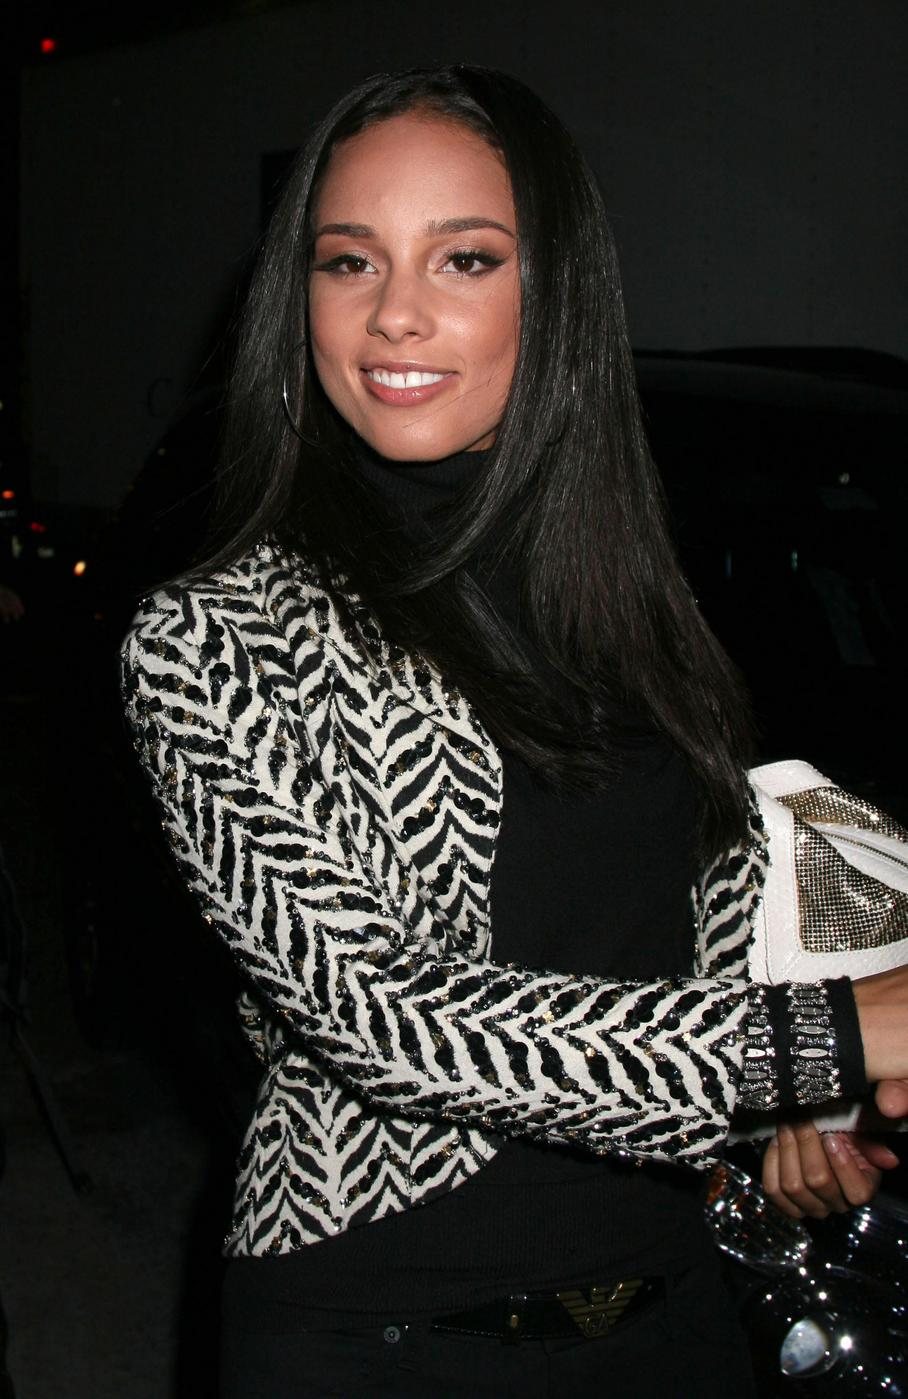 kafgallery: Celebrity Alicia Keys Hairstyle Wallpaper